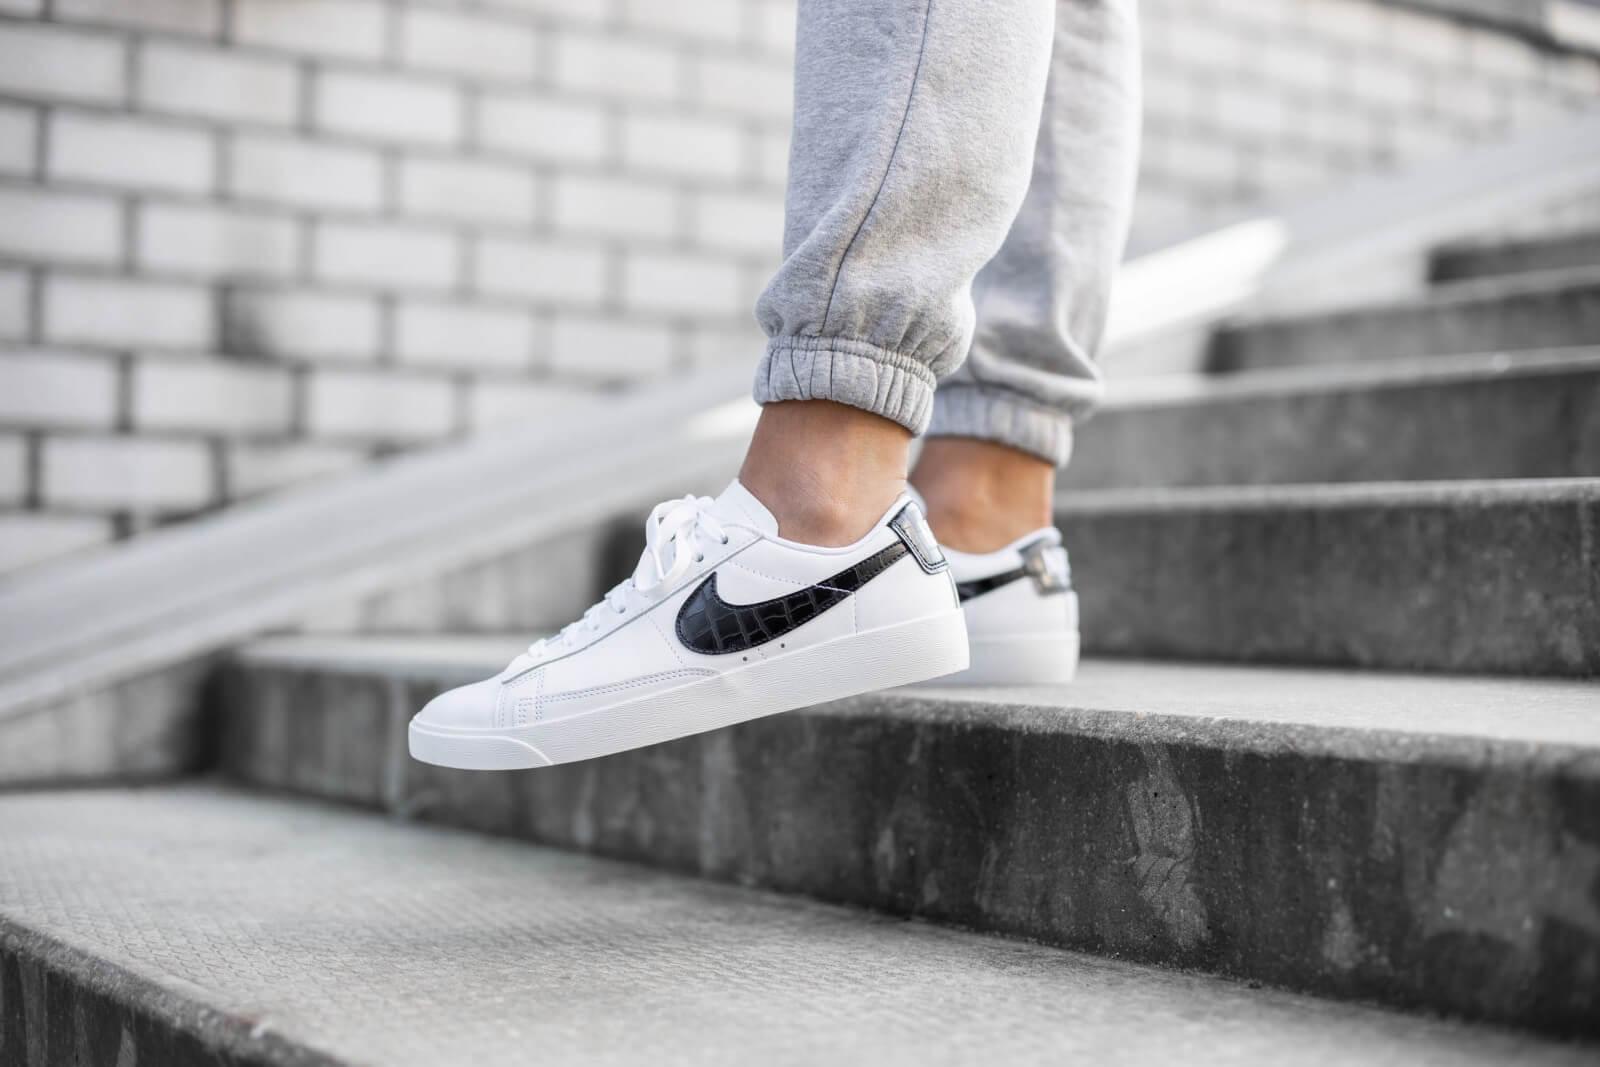 Nike Women's Blazer Low Croc WhiteBlack